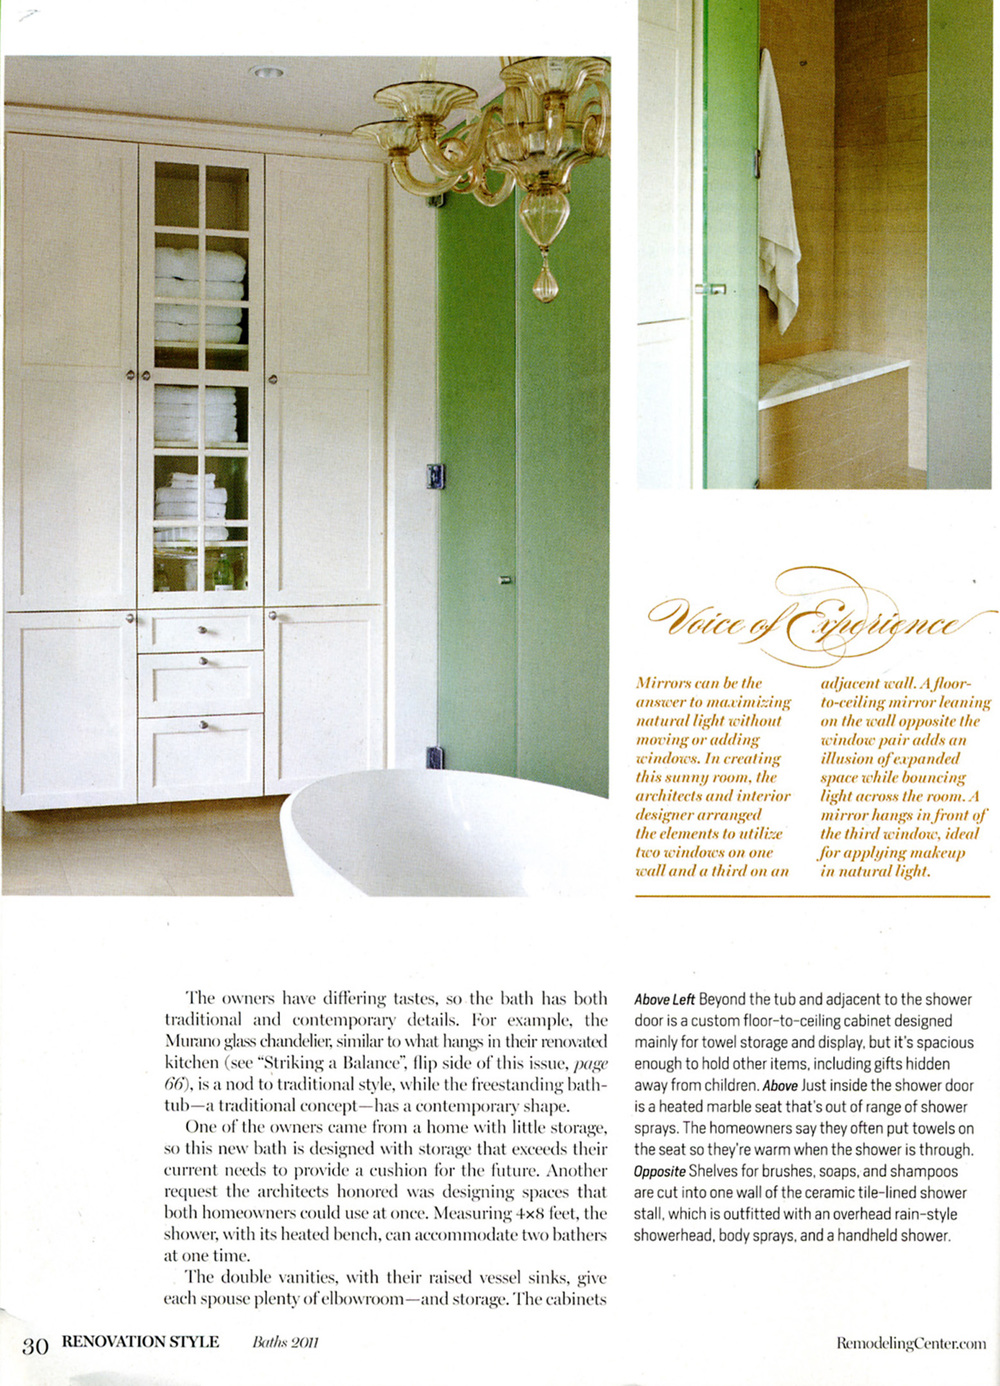 Bath Image_03.jpg